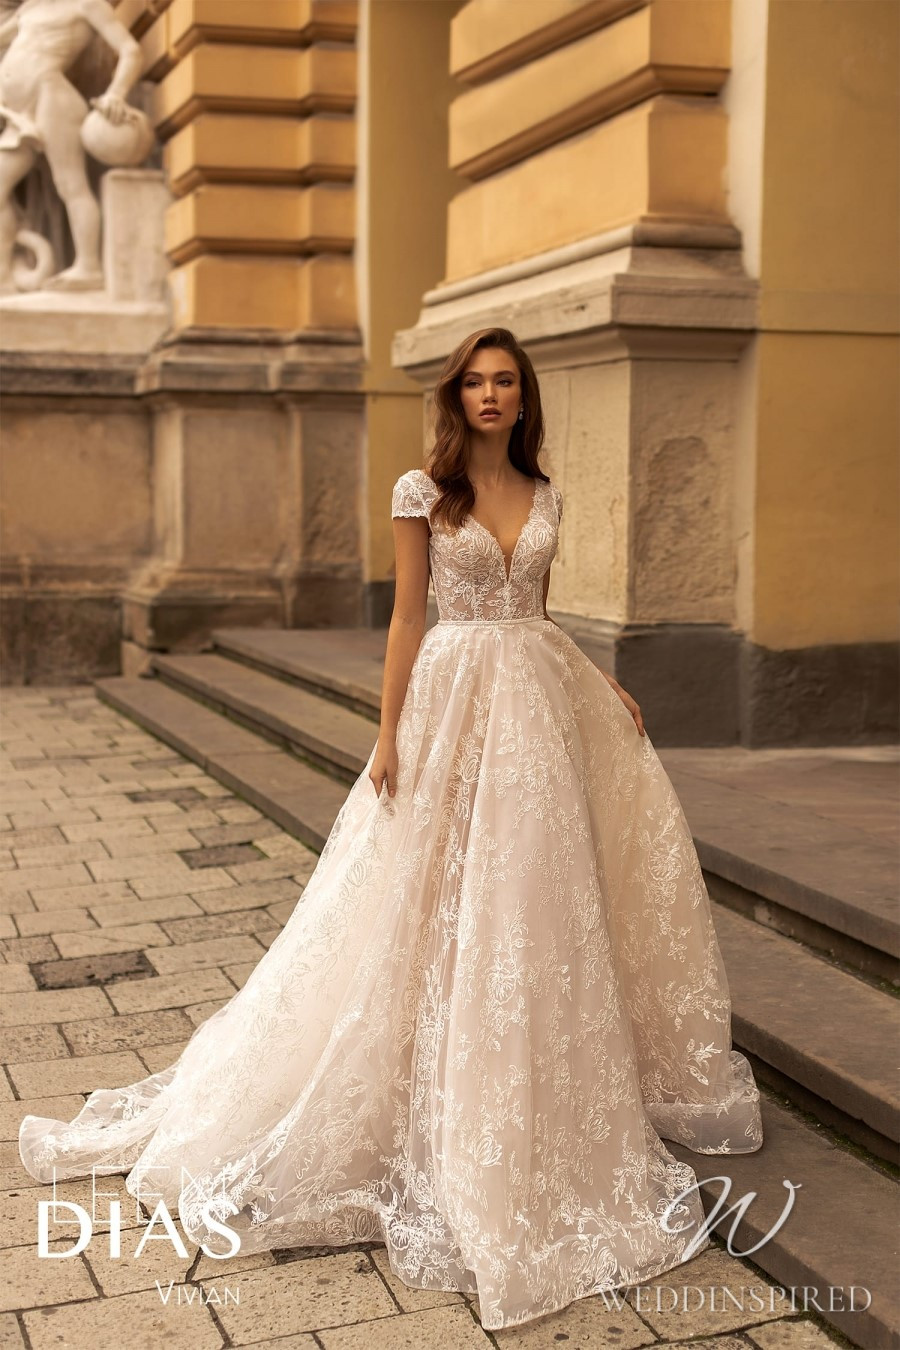 A Leen Dias 2021 lace princess wedding dress with cap sleeves